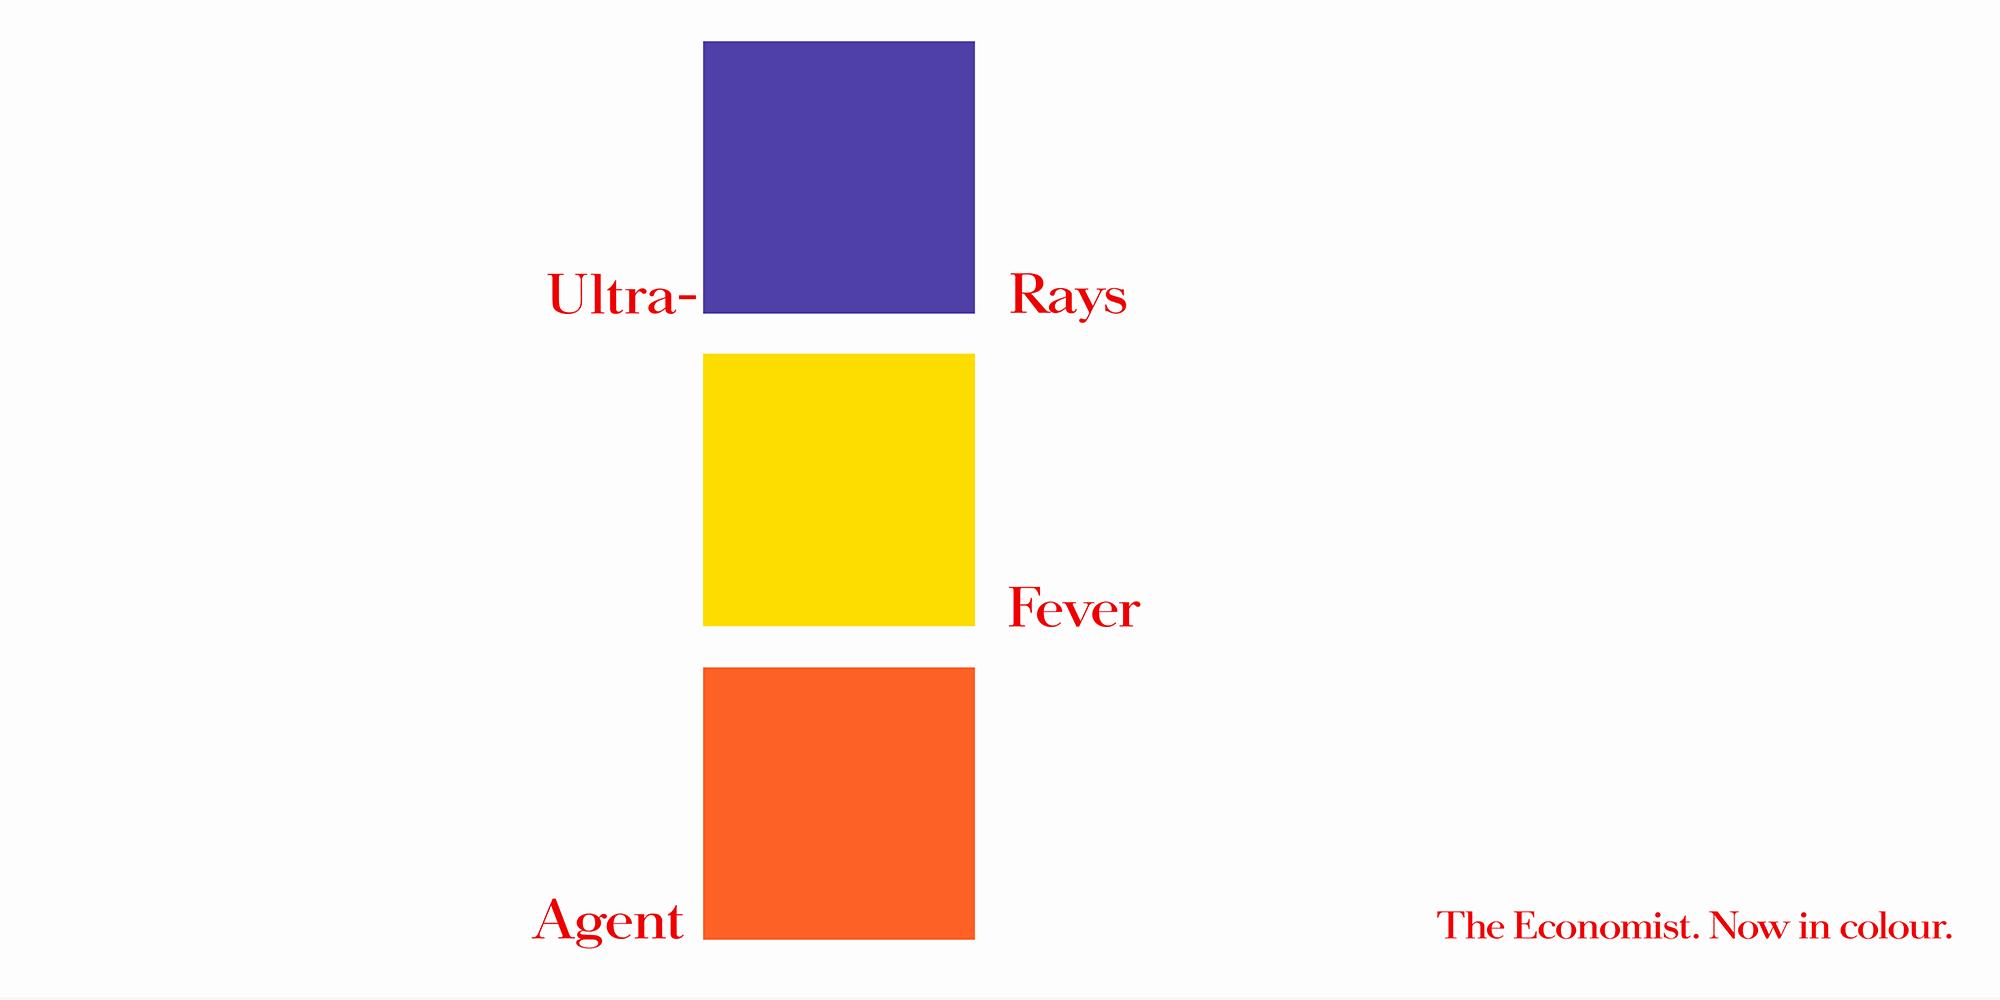 'Ultra-Violet' The Economist_Colour, Dave Dye, AMV_BBDO